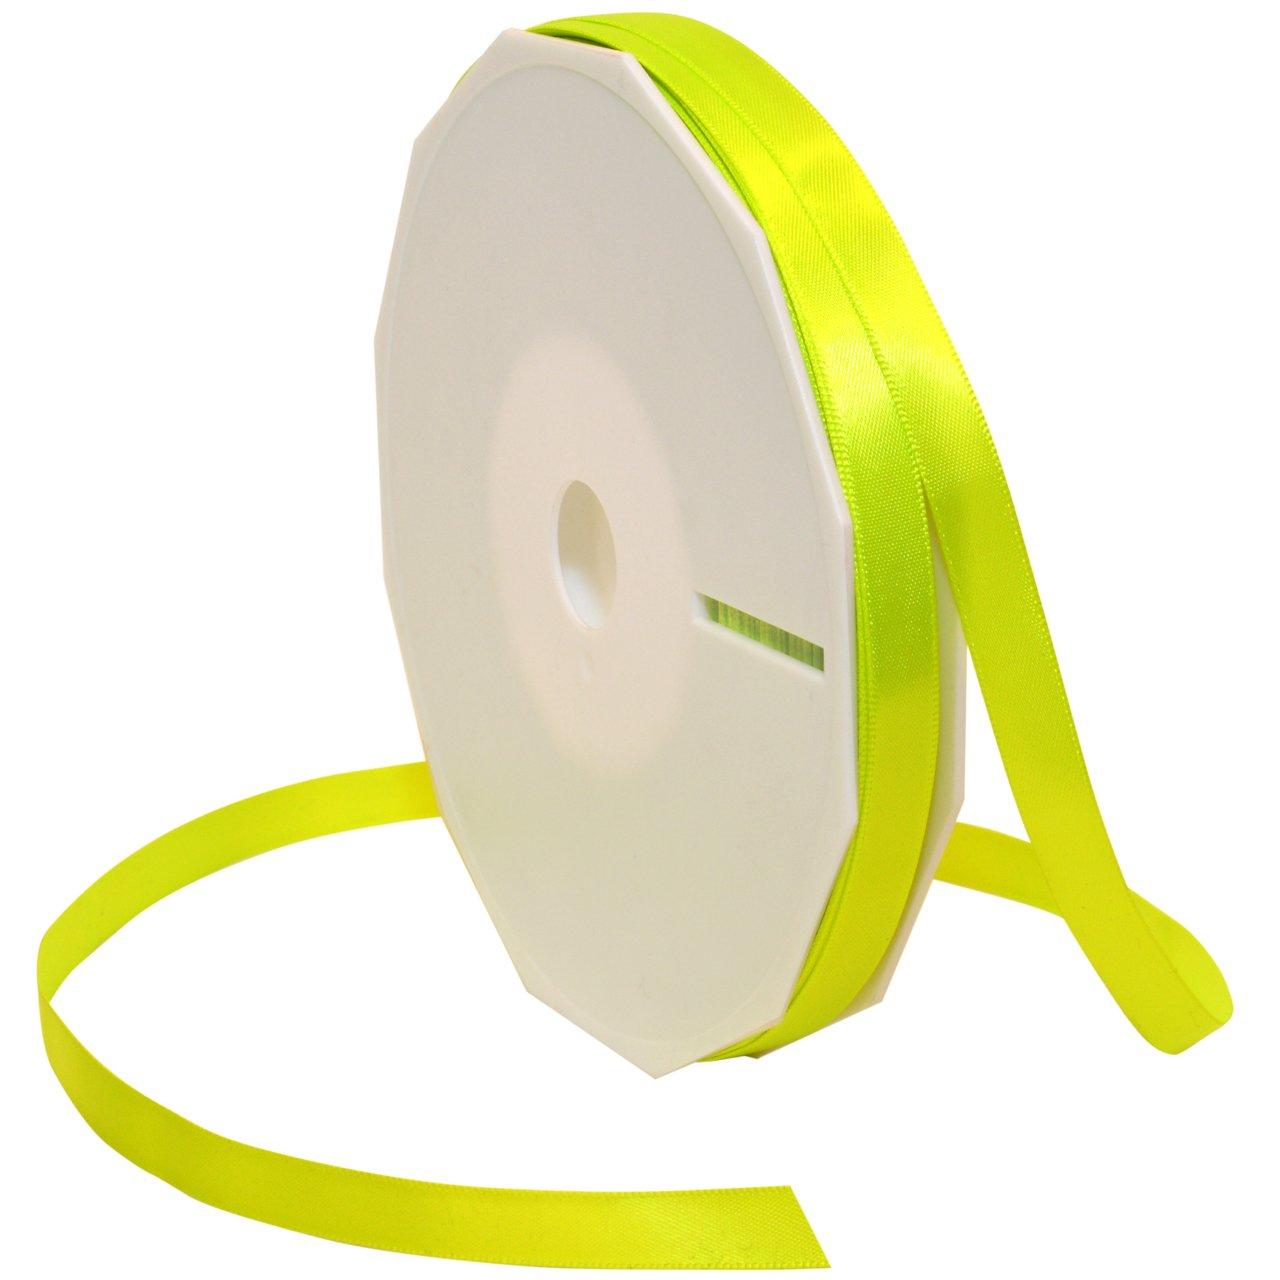 Morex Ribbon Neon Brights Satin, 3/8-inch by 50-yard, Neon Yellow by Morex Ribbon   B00BHCH1B6